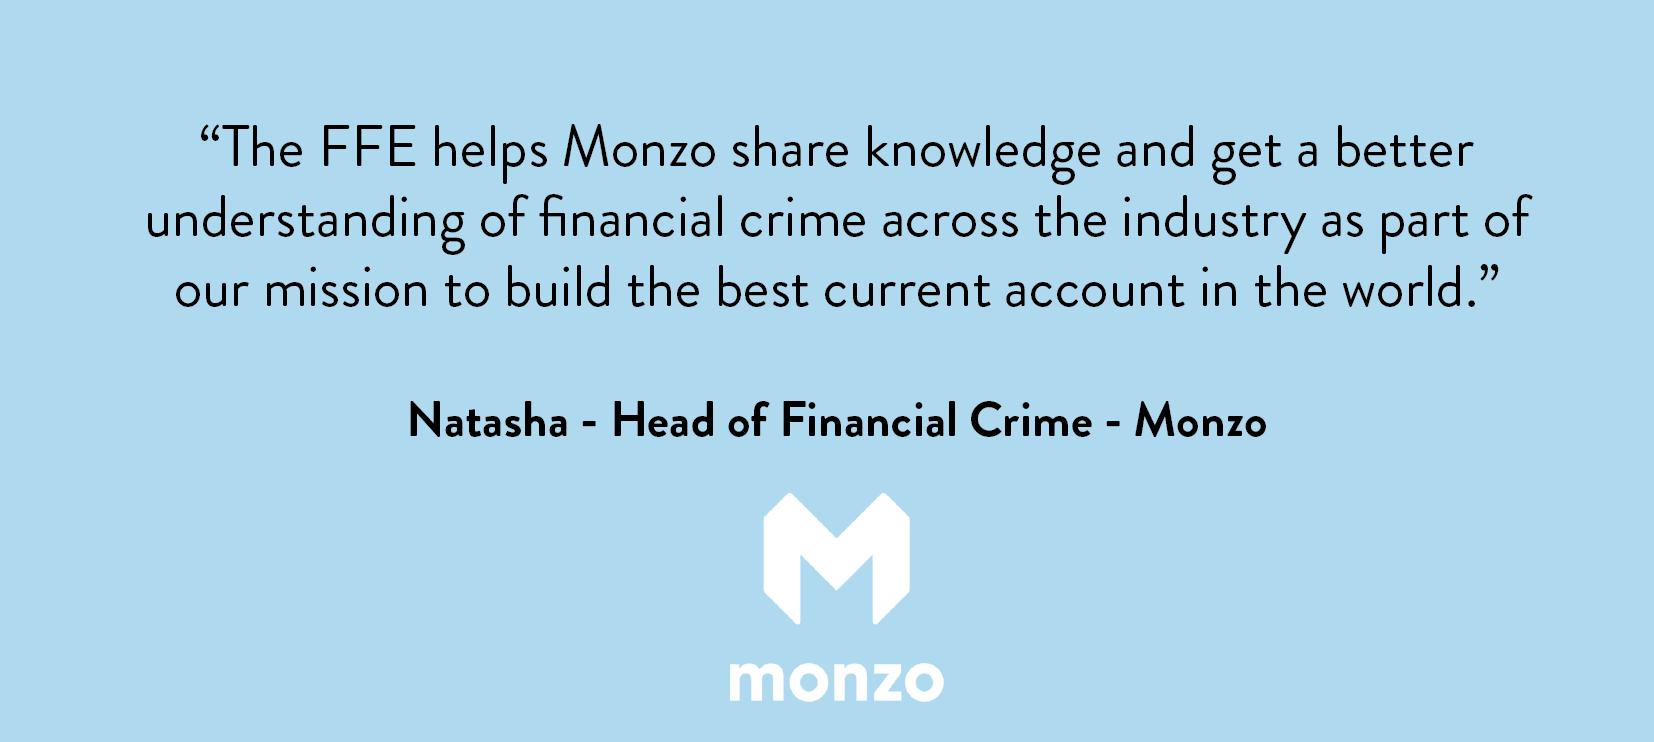 FFE website quotes_Natasha Monzo.png